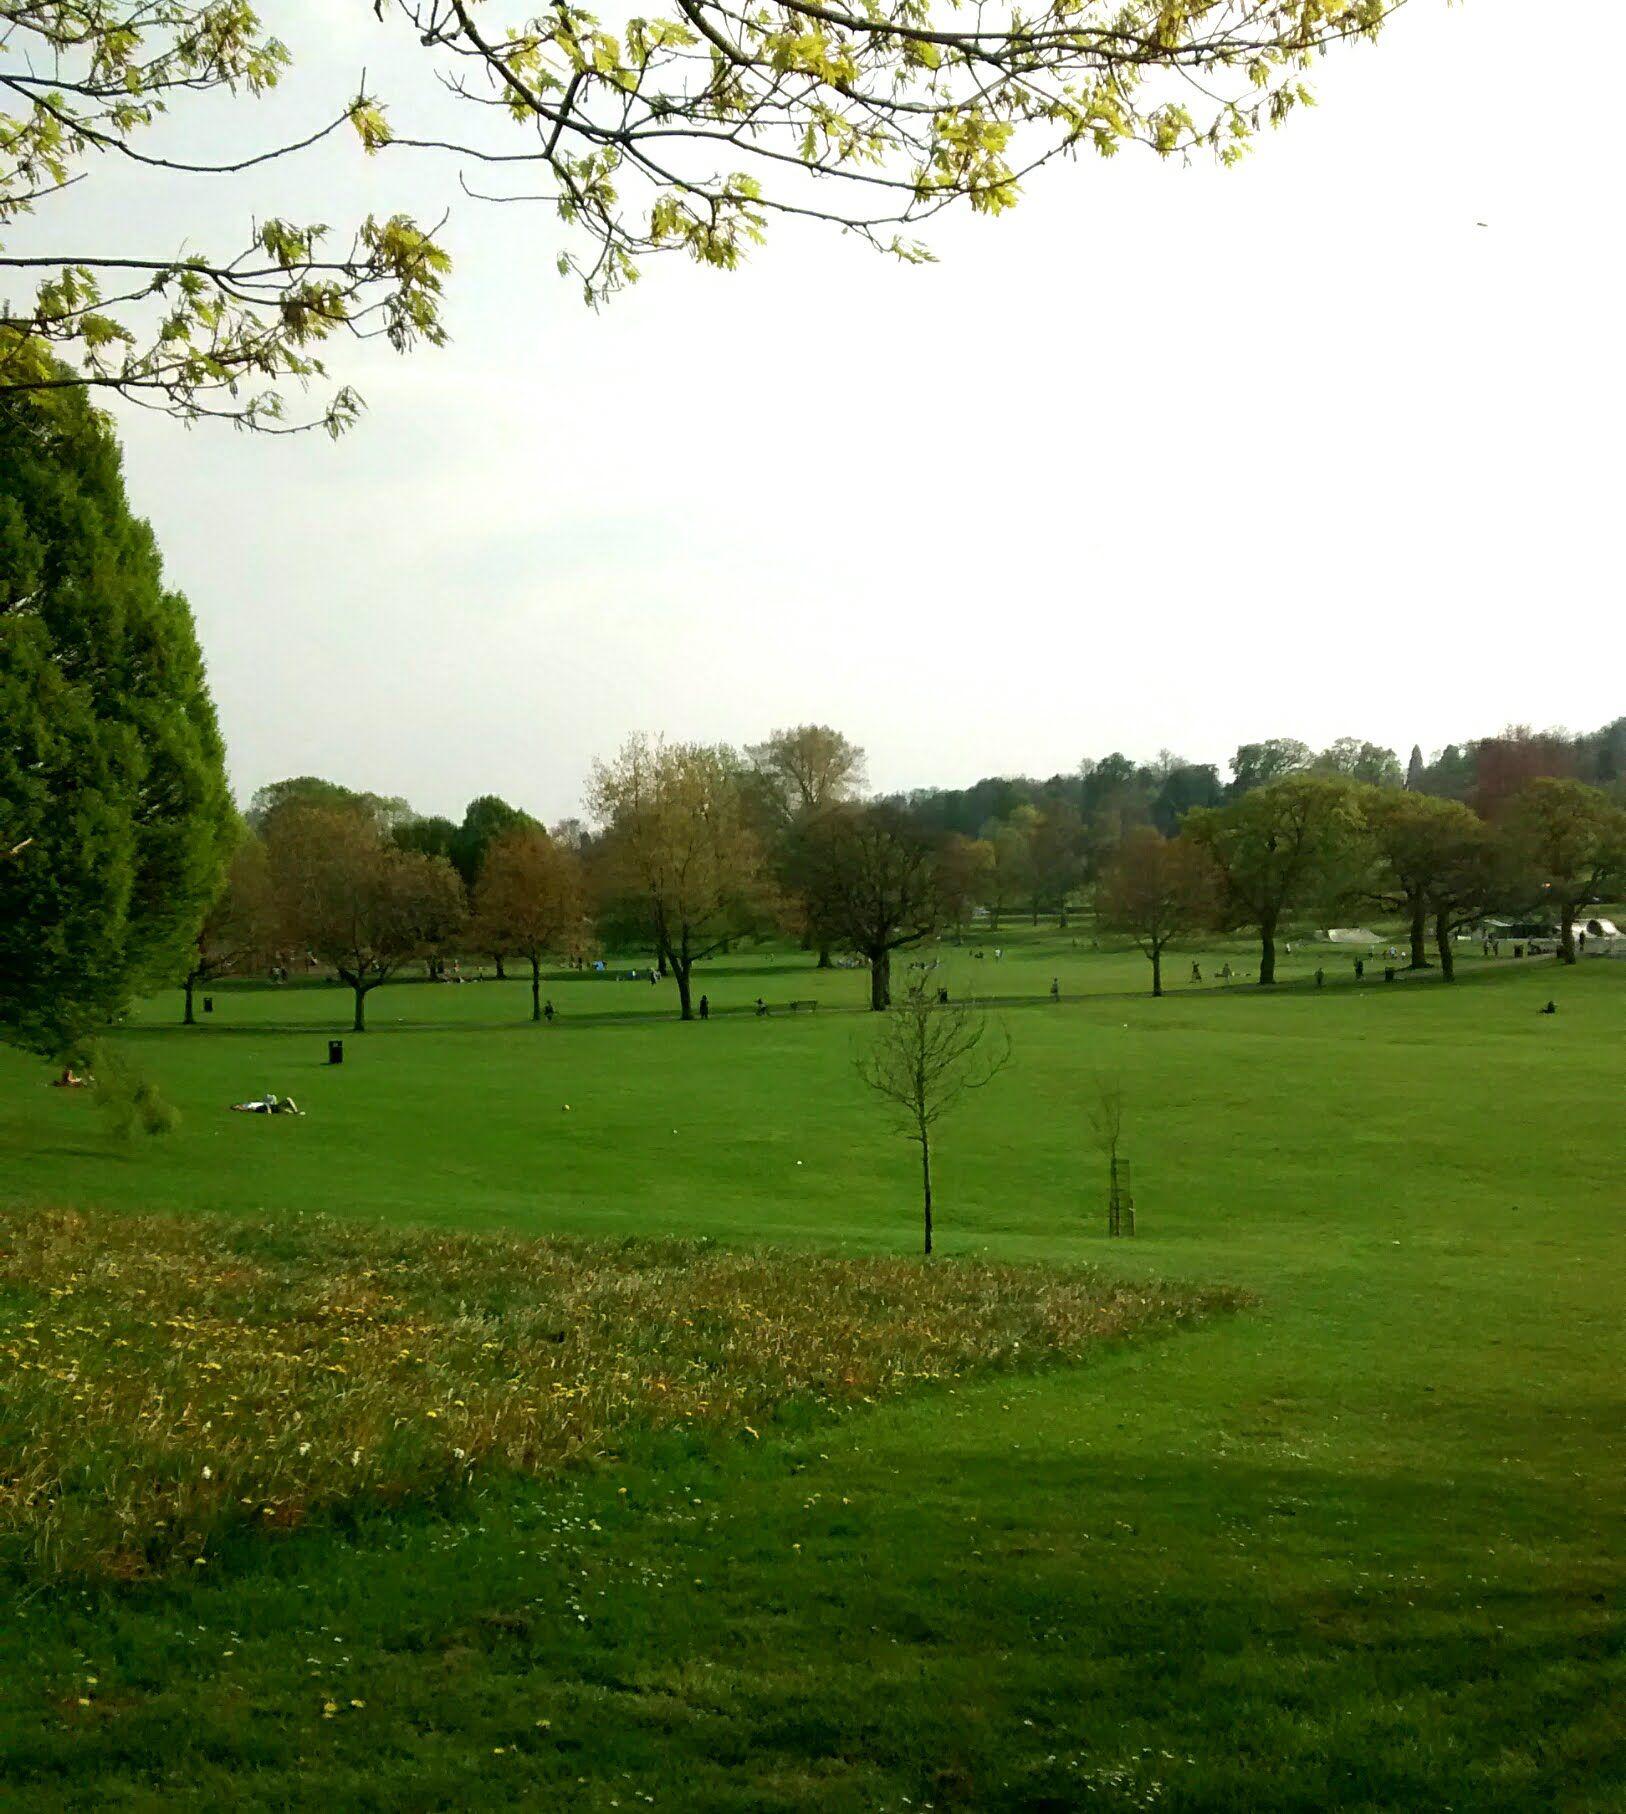 Gadebridge Park, Hertfordshire